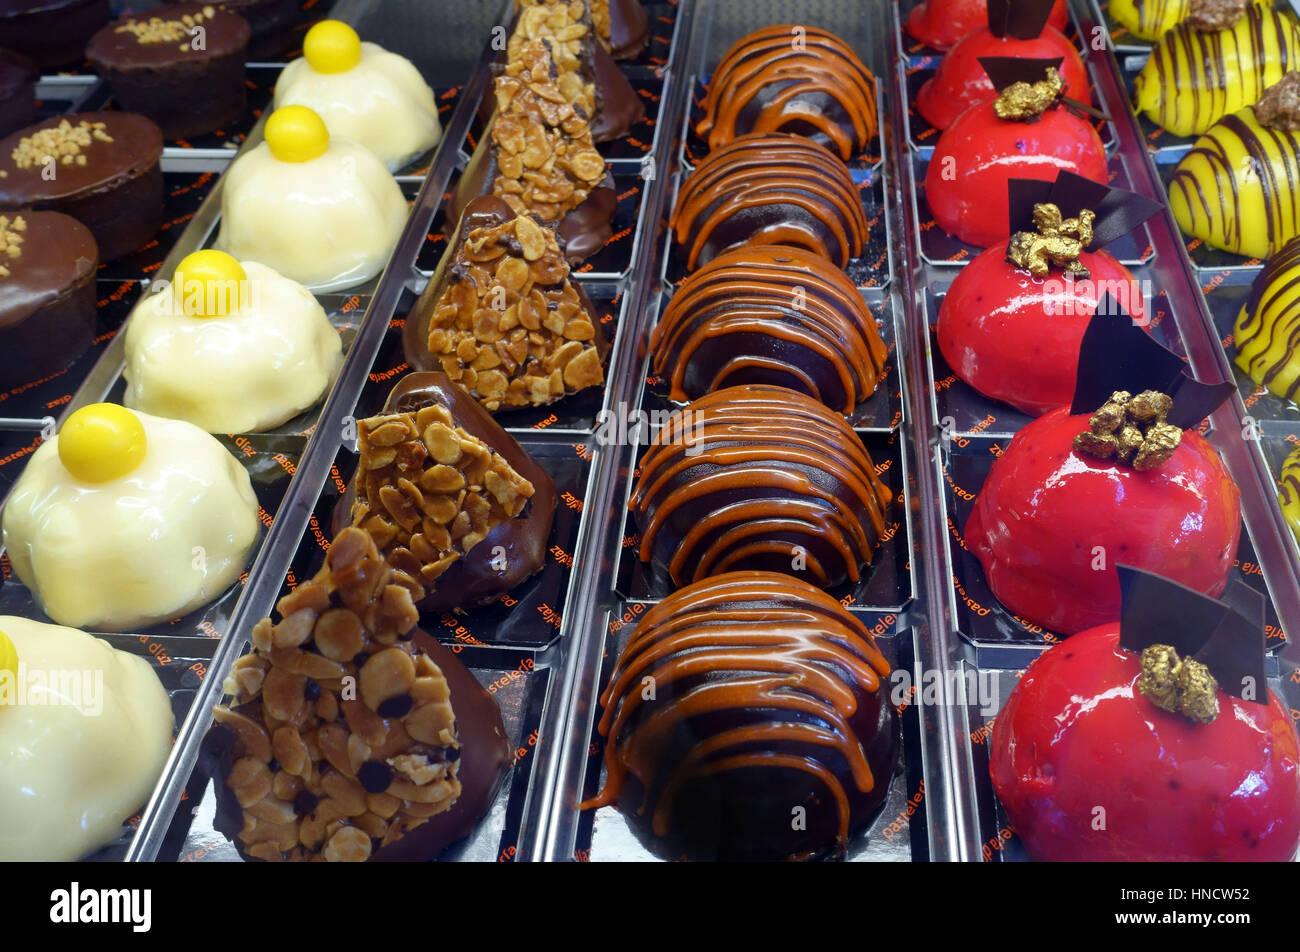 Cakes in pasteleria in Santa Cruz de Tenerife, Canary Islands, Spain - Stock Image